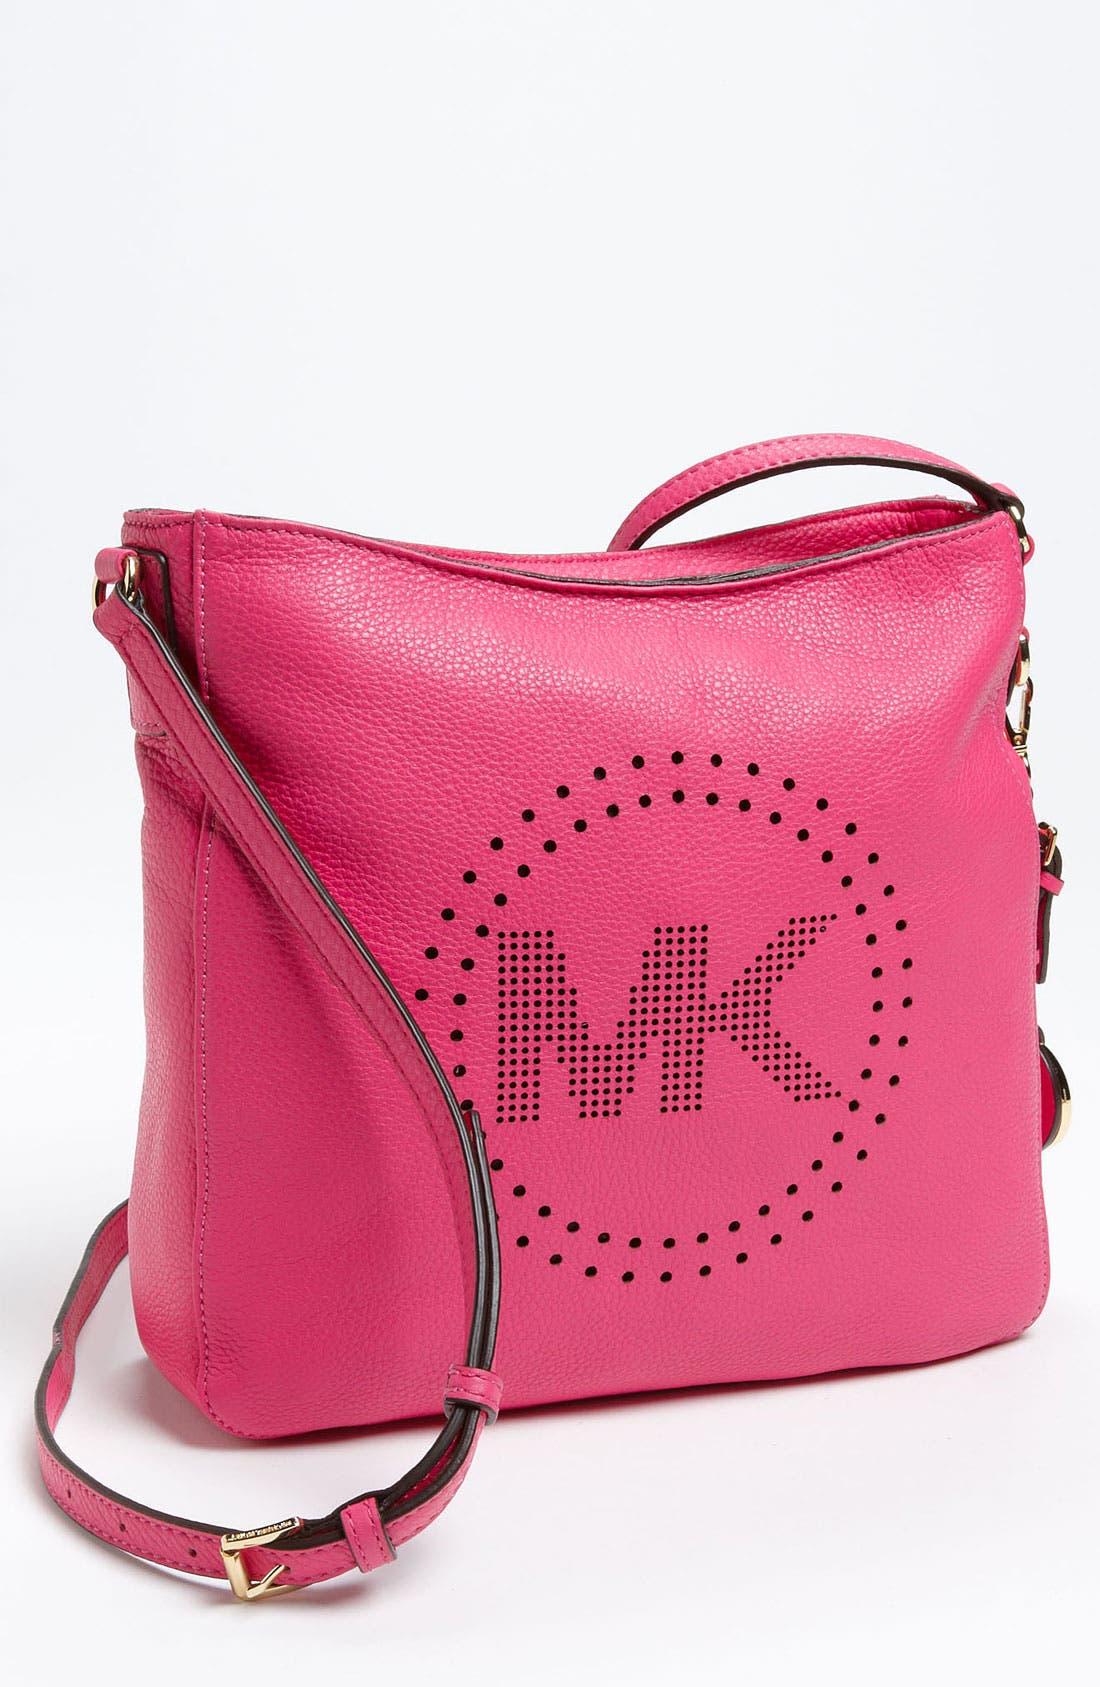 Alternate Image 1 Selected - MICHAEL Michael Kors 'Perforated MK - Large' Leather Messenger Bag